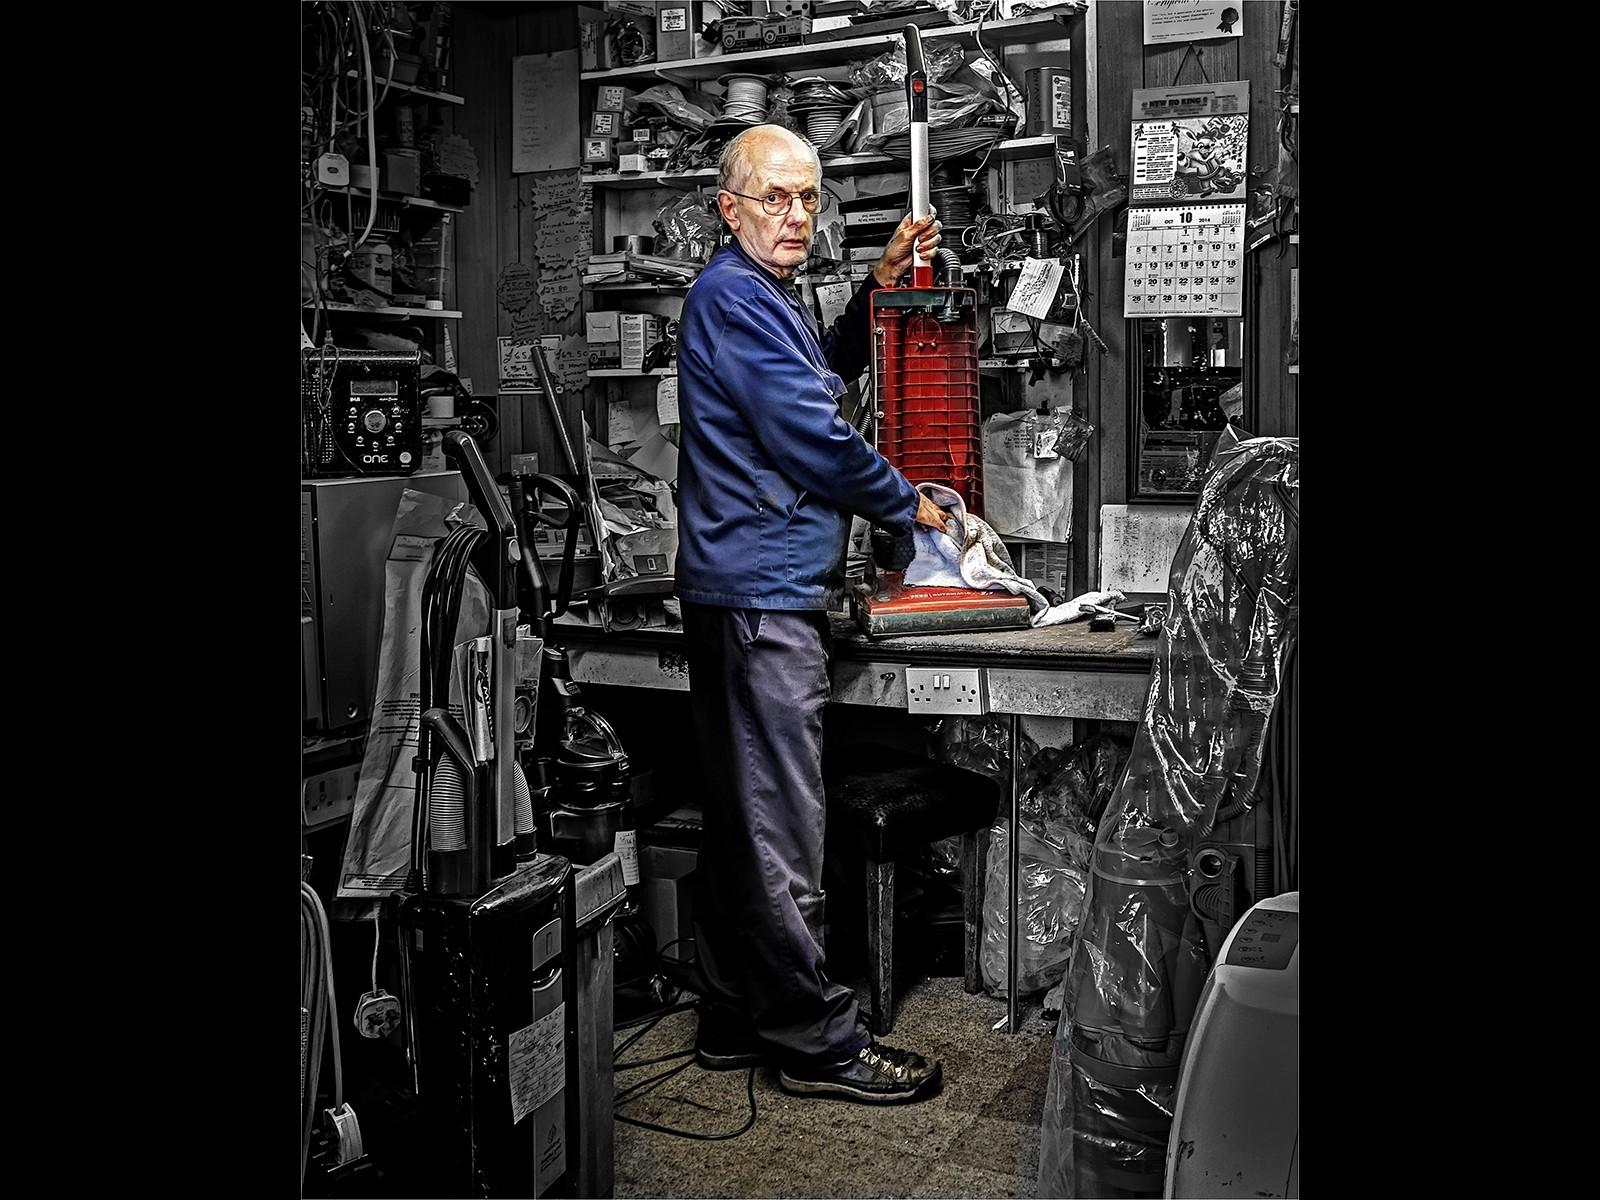 The vacum repair man in his workshop